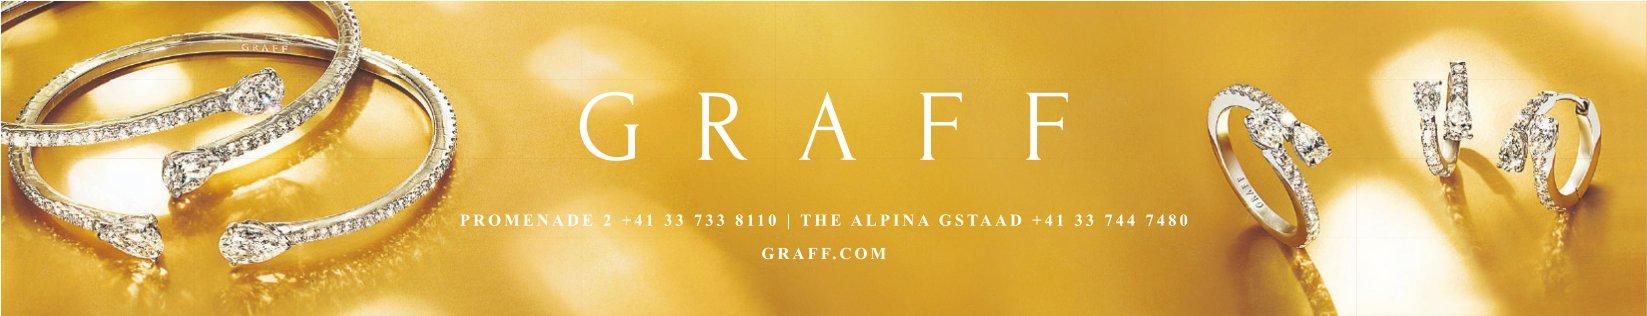 Graff - Gstaad